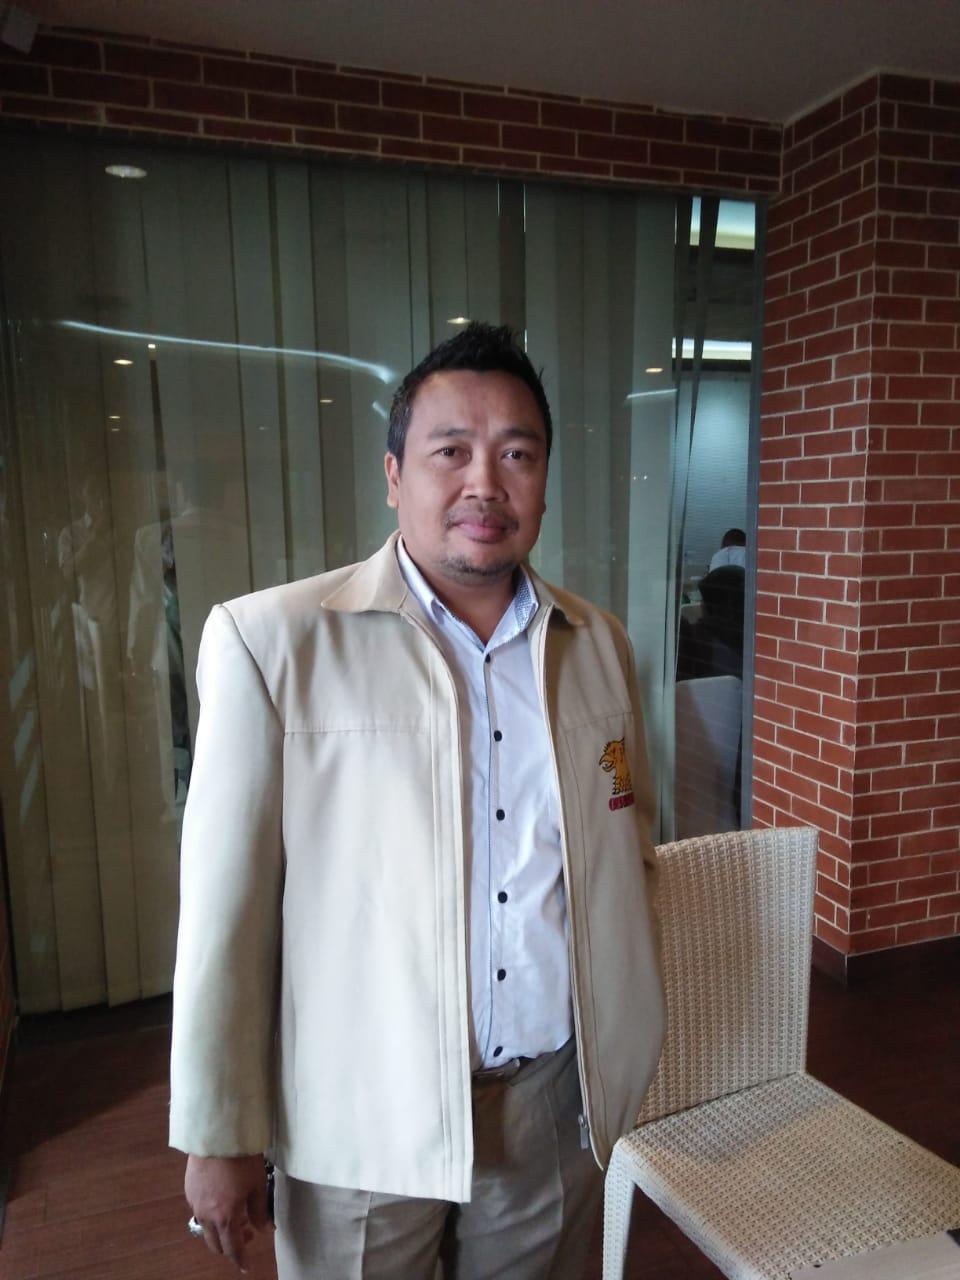 Jamal Tegaskan: Pradi Siap Pisah Dengan Idris di Pilkada 2020